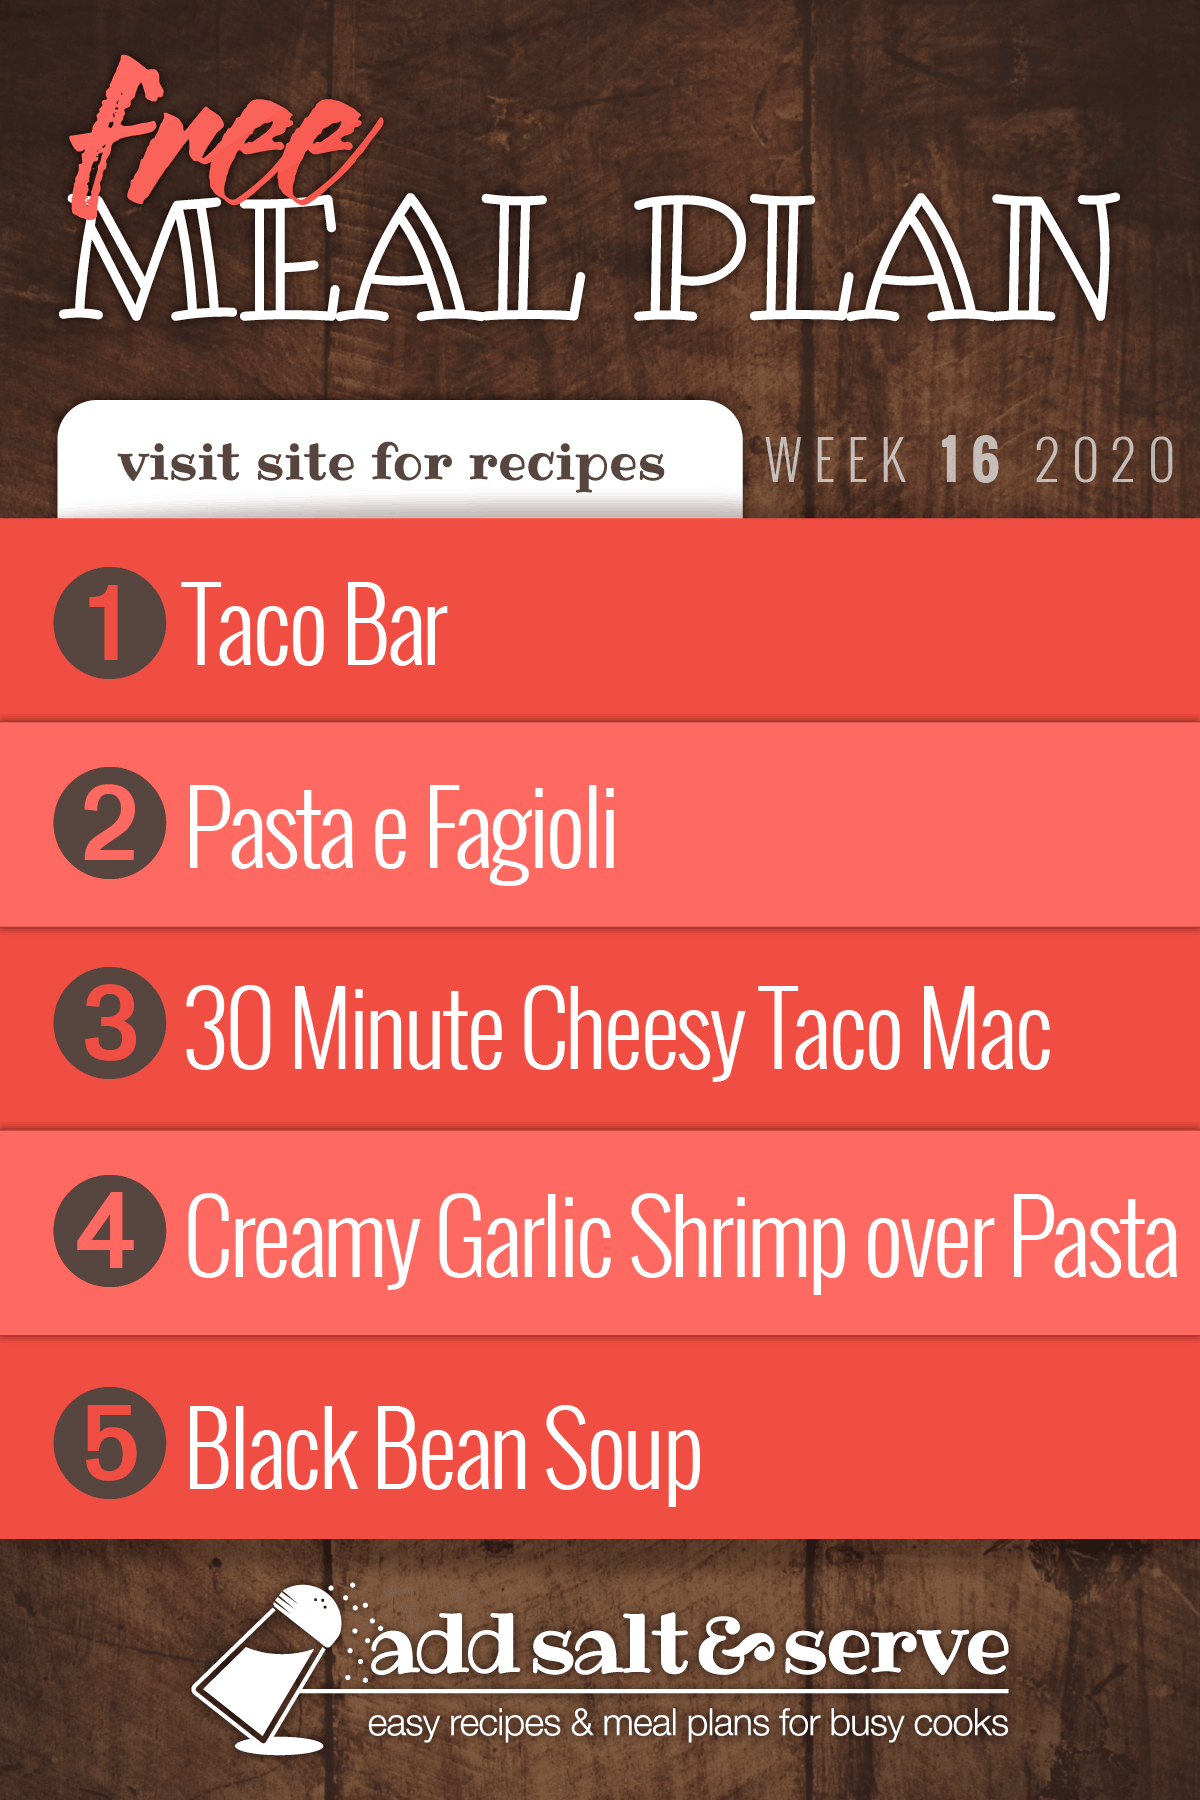 Free Meal Plan for Week 16 2020: Taco Bar, Pasta e Fagioli, 30 Minutes Cheesy Taco Macaroni, Creamy Garlic Shrimp over Angel Hair Pasta, Black Bean Soup - Visit site for recipes - Add Salt & Serve